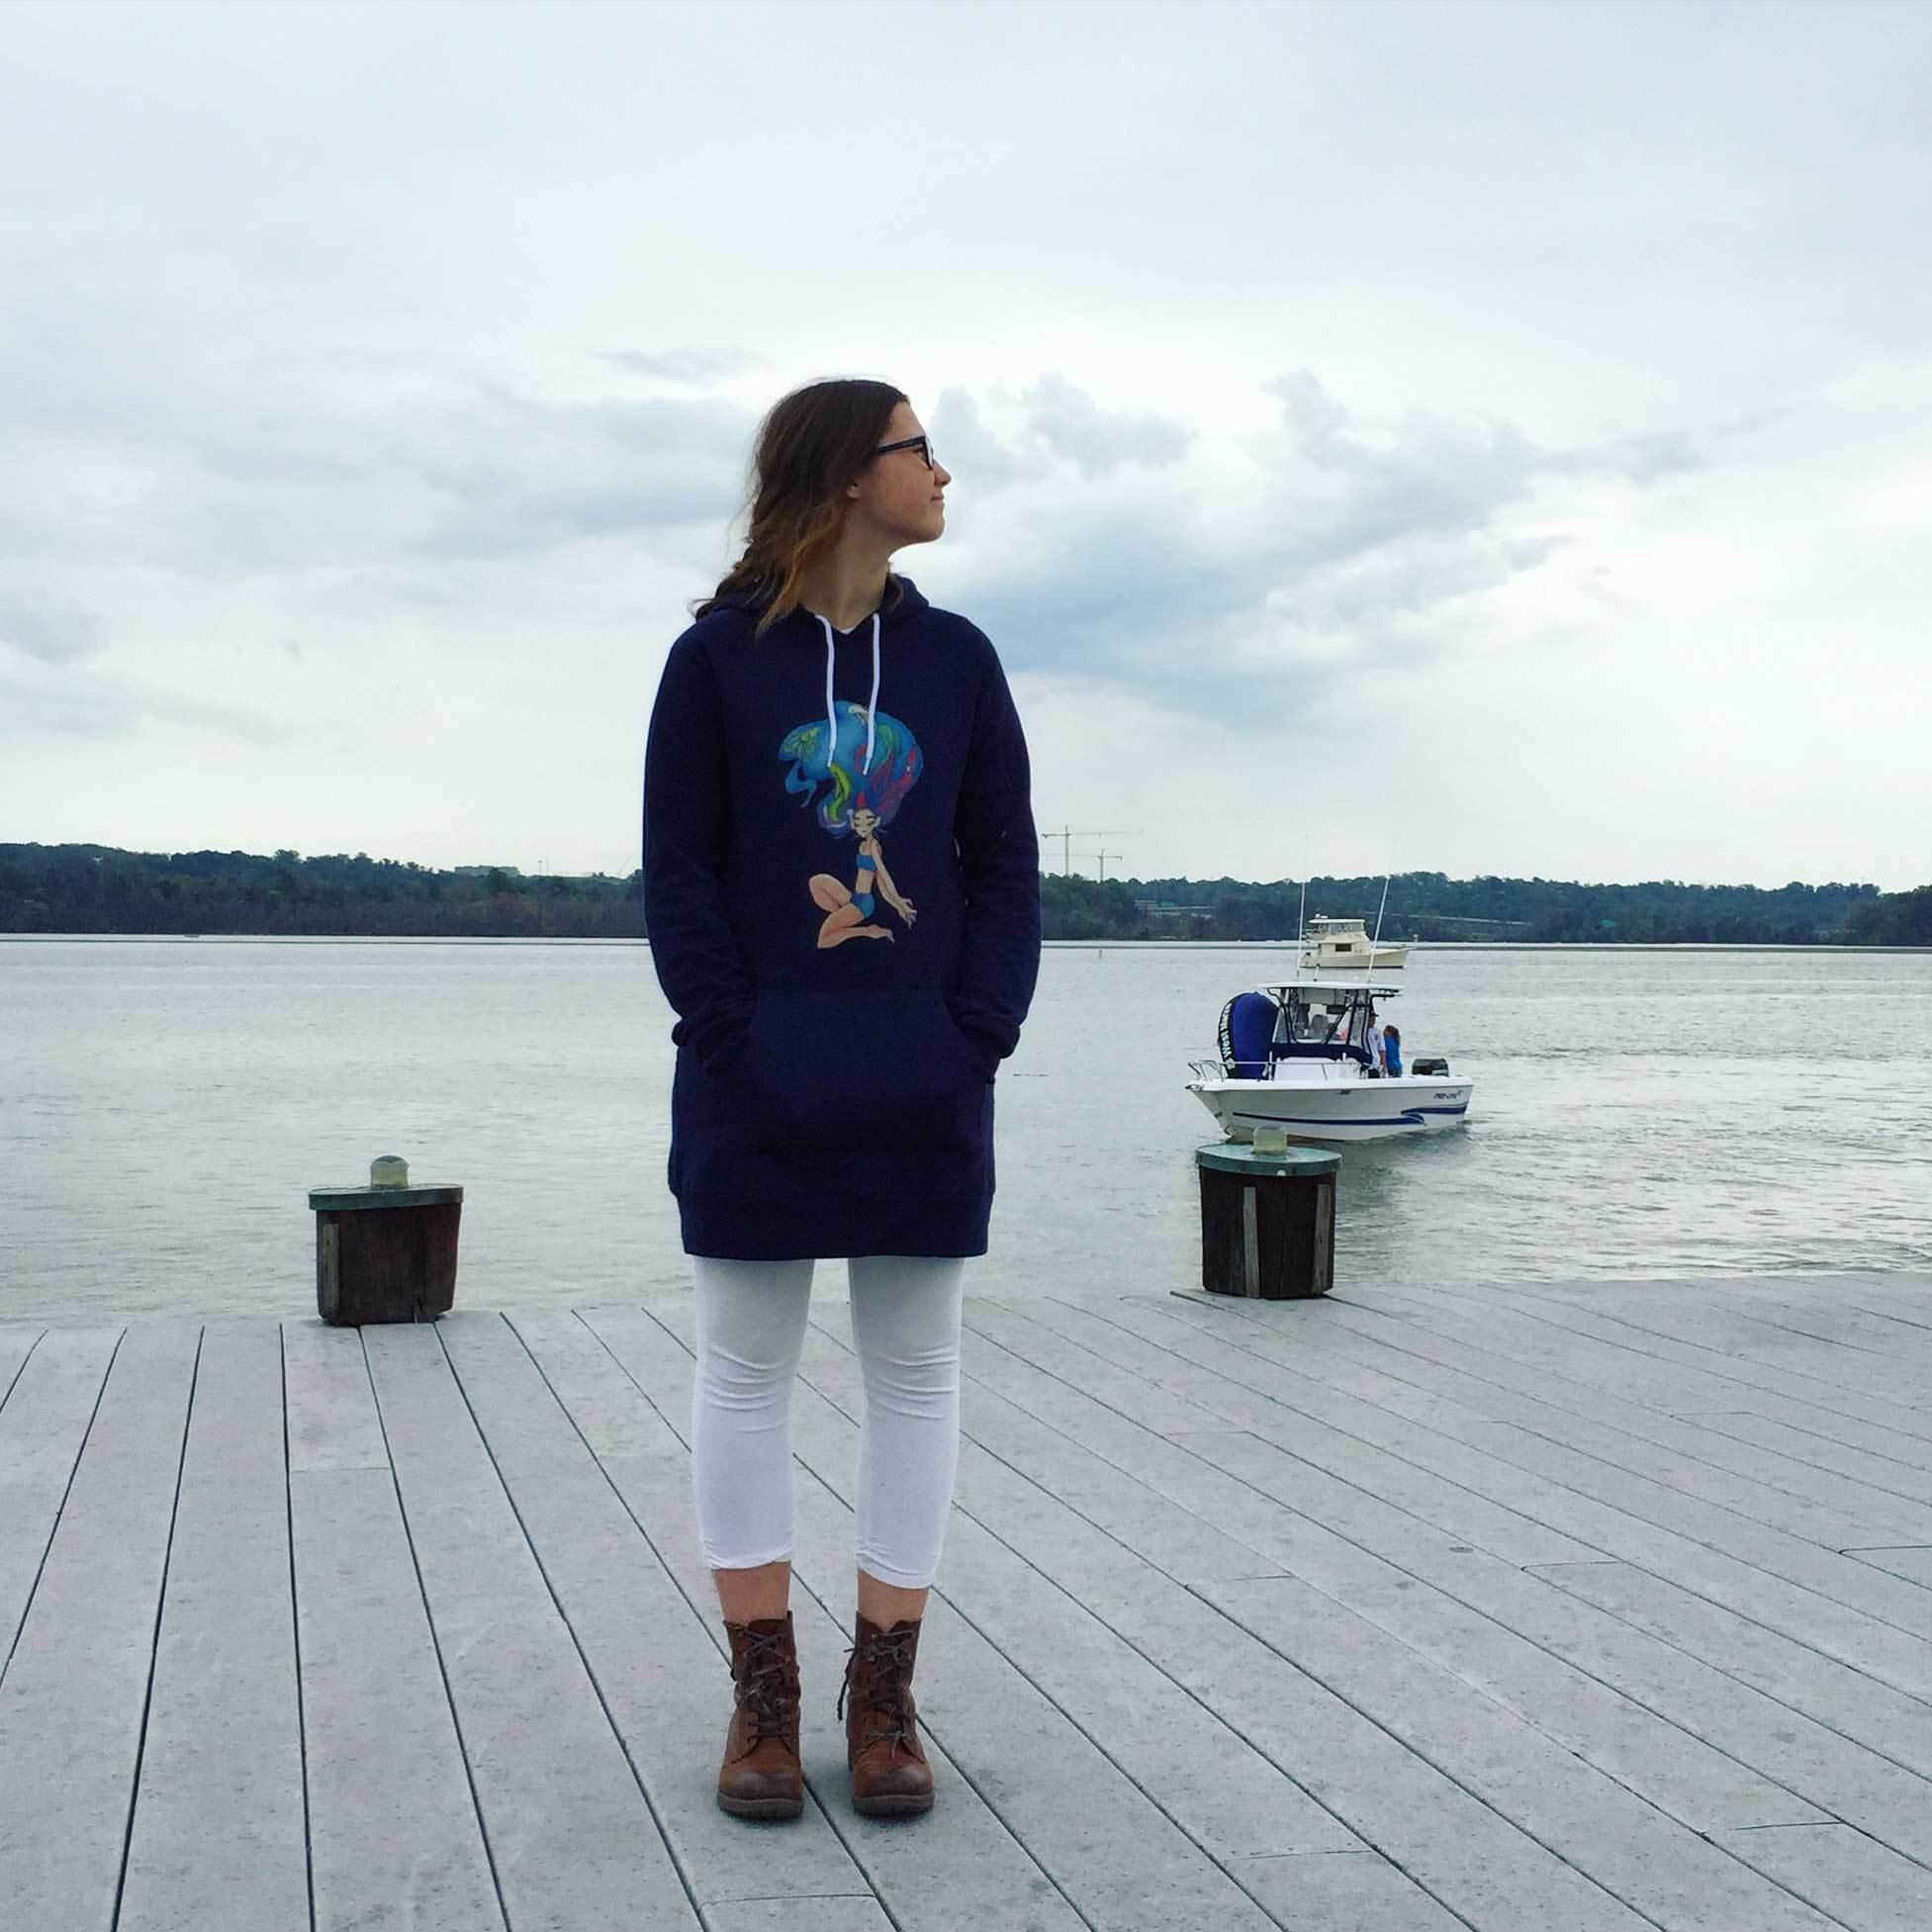 Teenager artist opens her own shop gabypie.com